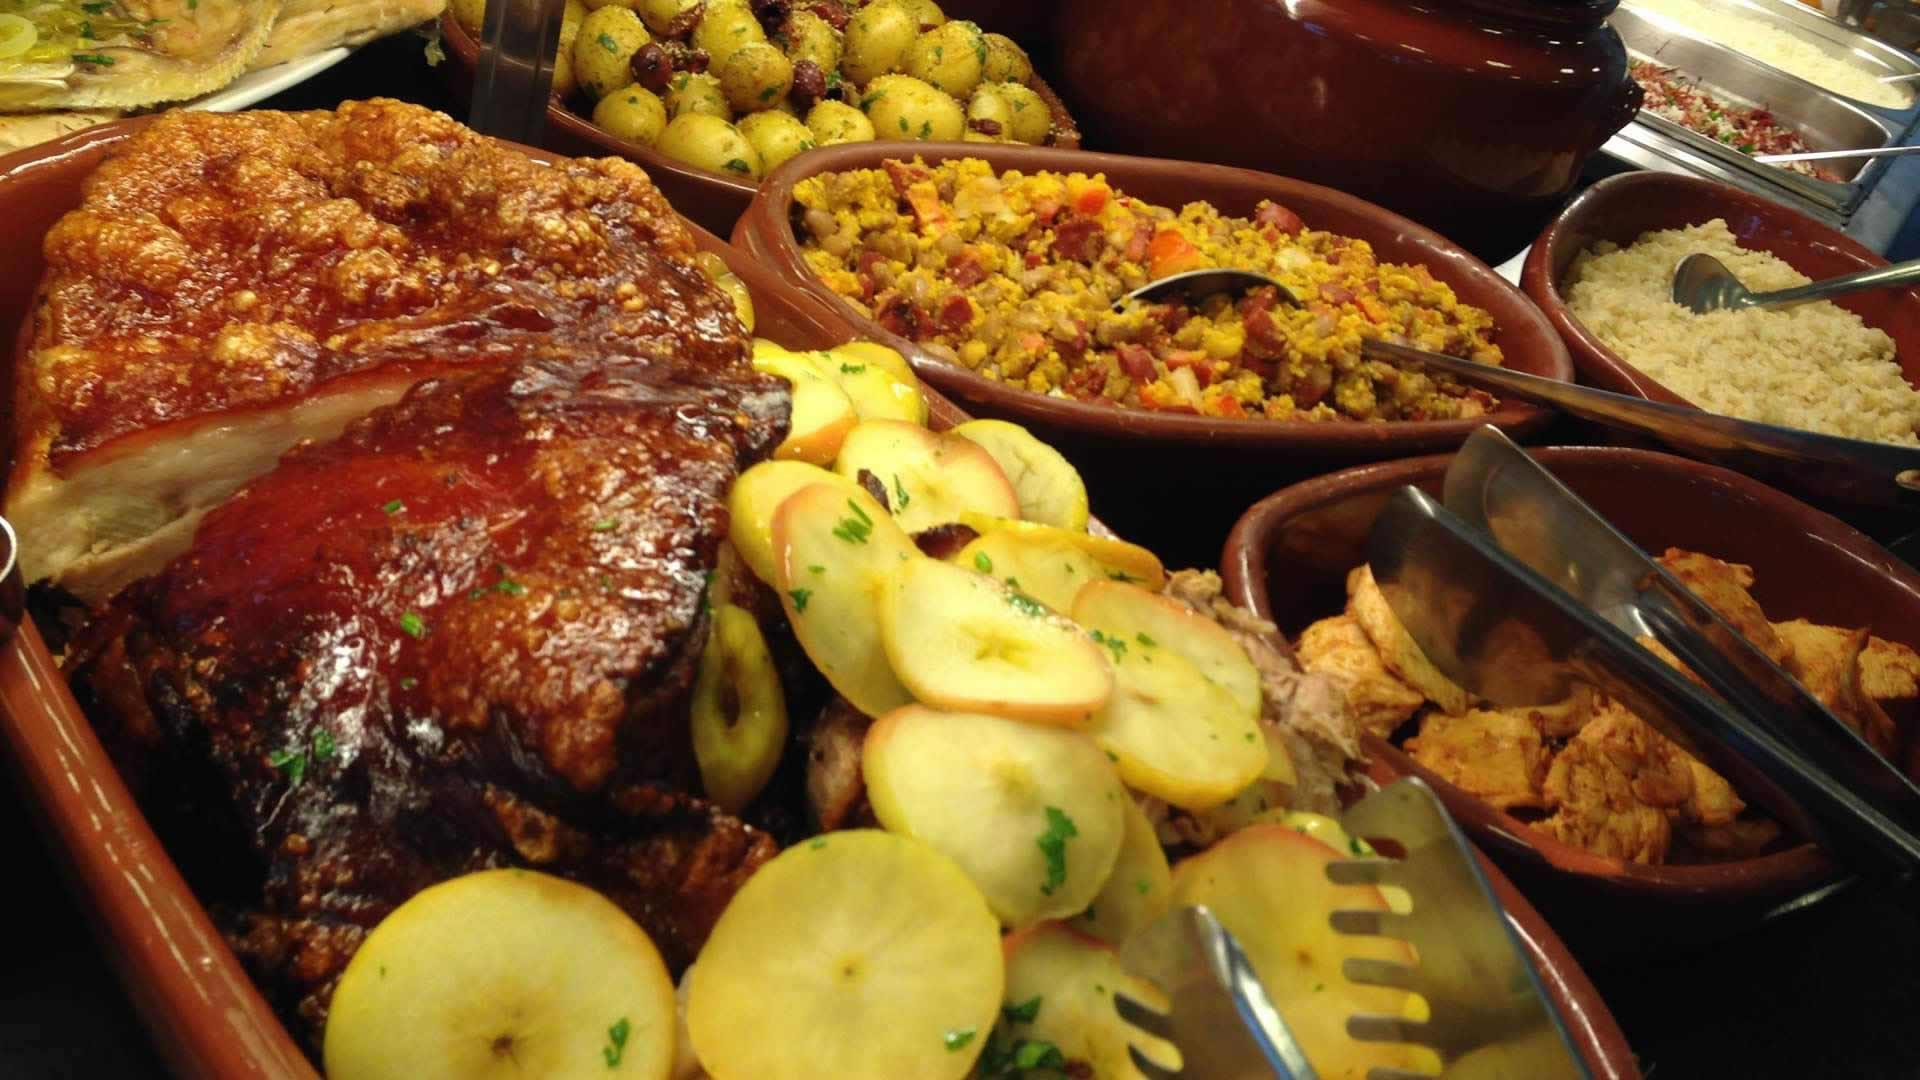 Domingo: dia de descanso e de saborear uma boa comida mineira no Joá!